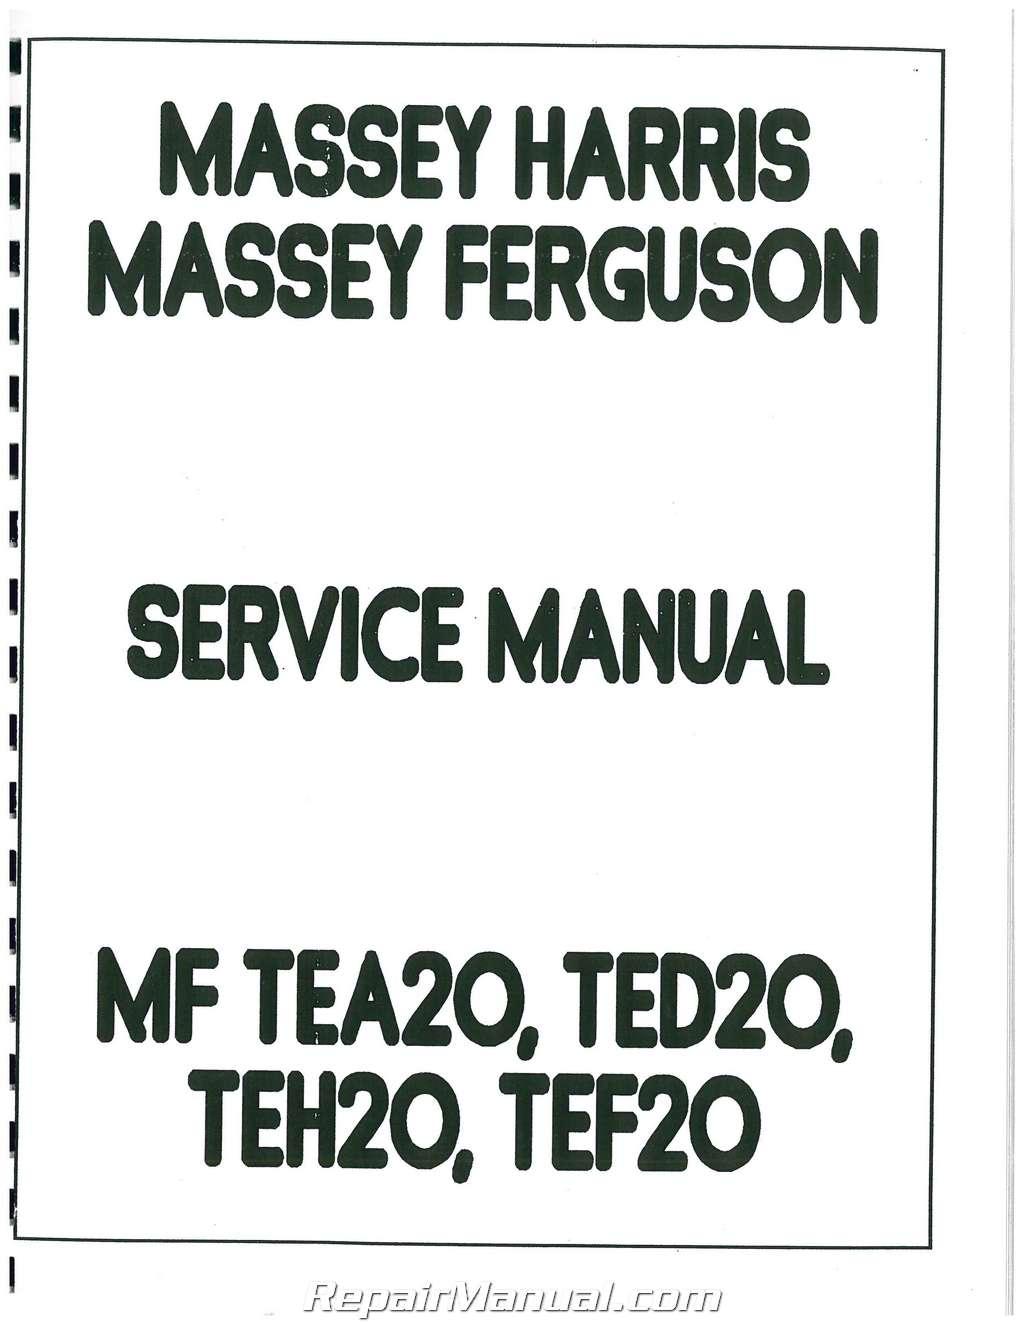 massey ferguson tea 20 ted 20 tractor service manual rh repairmanual com User Manual PDF Service Manuals